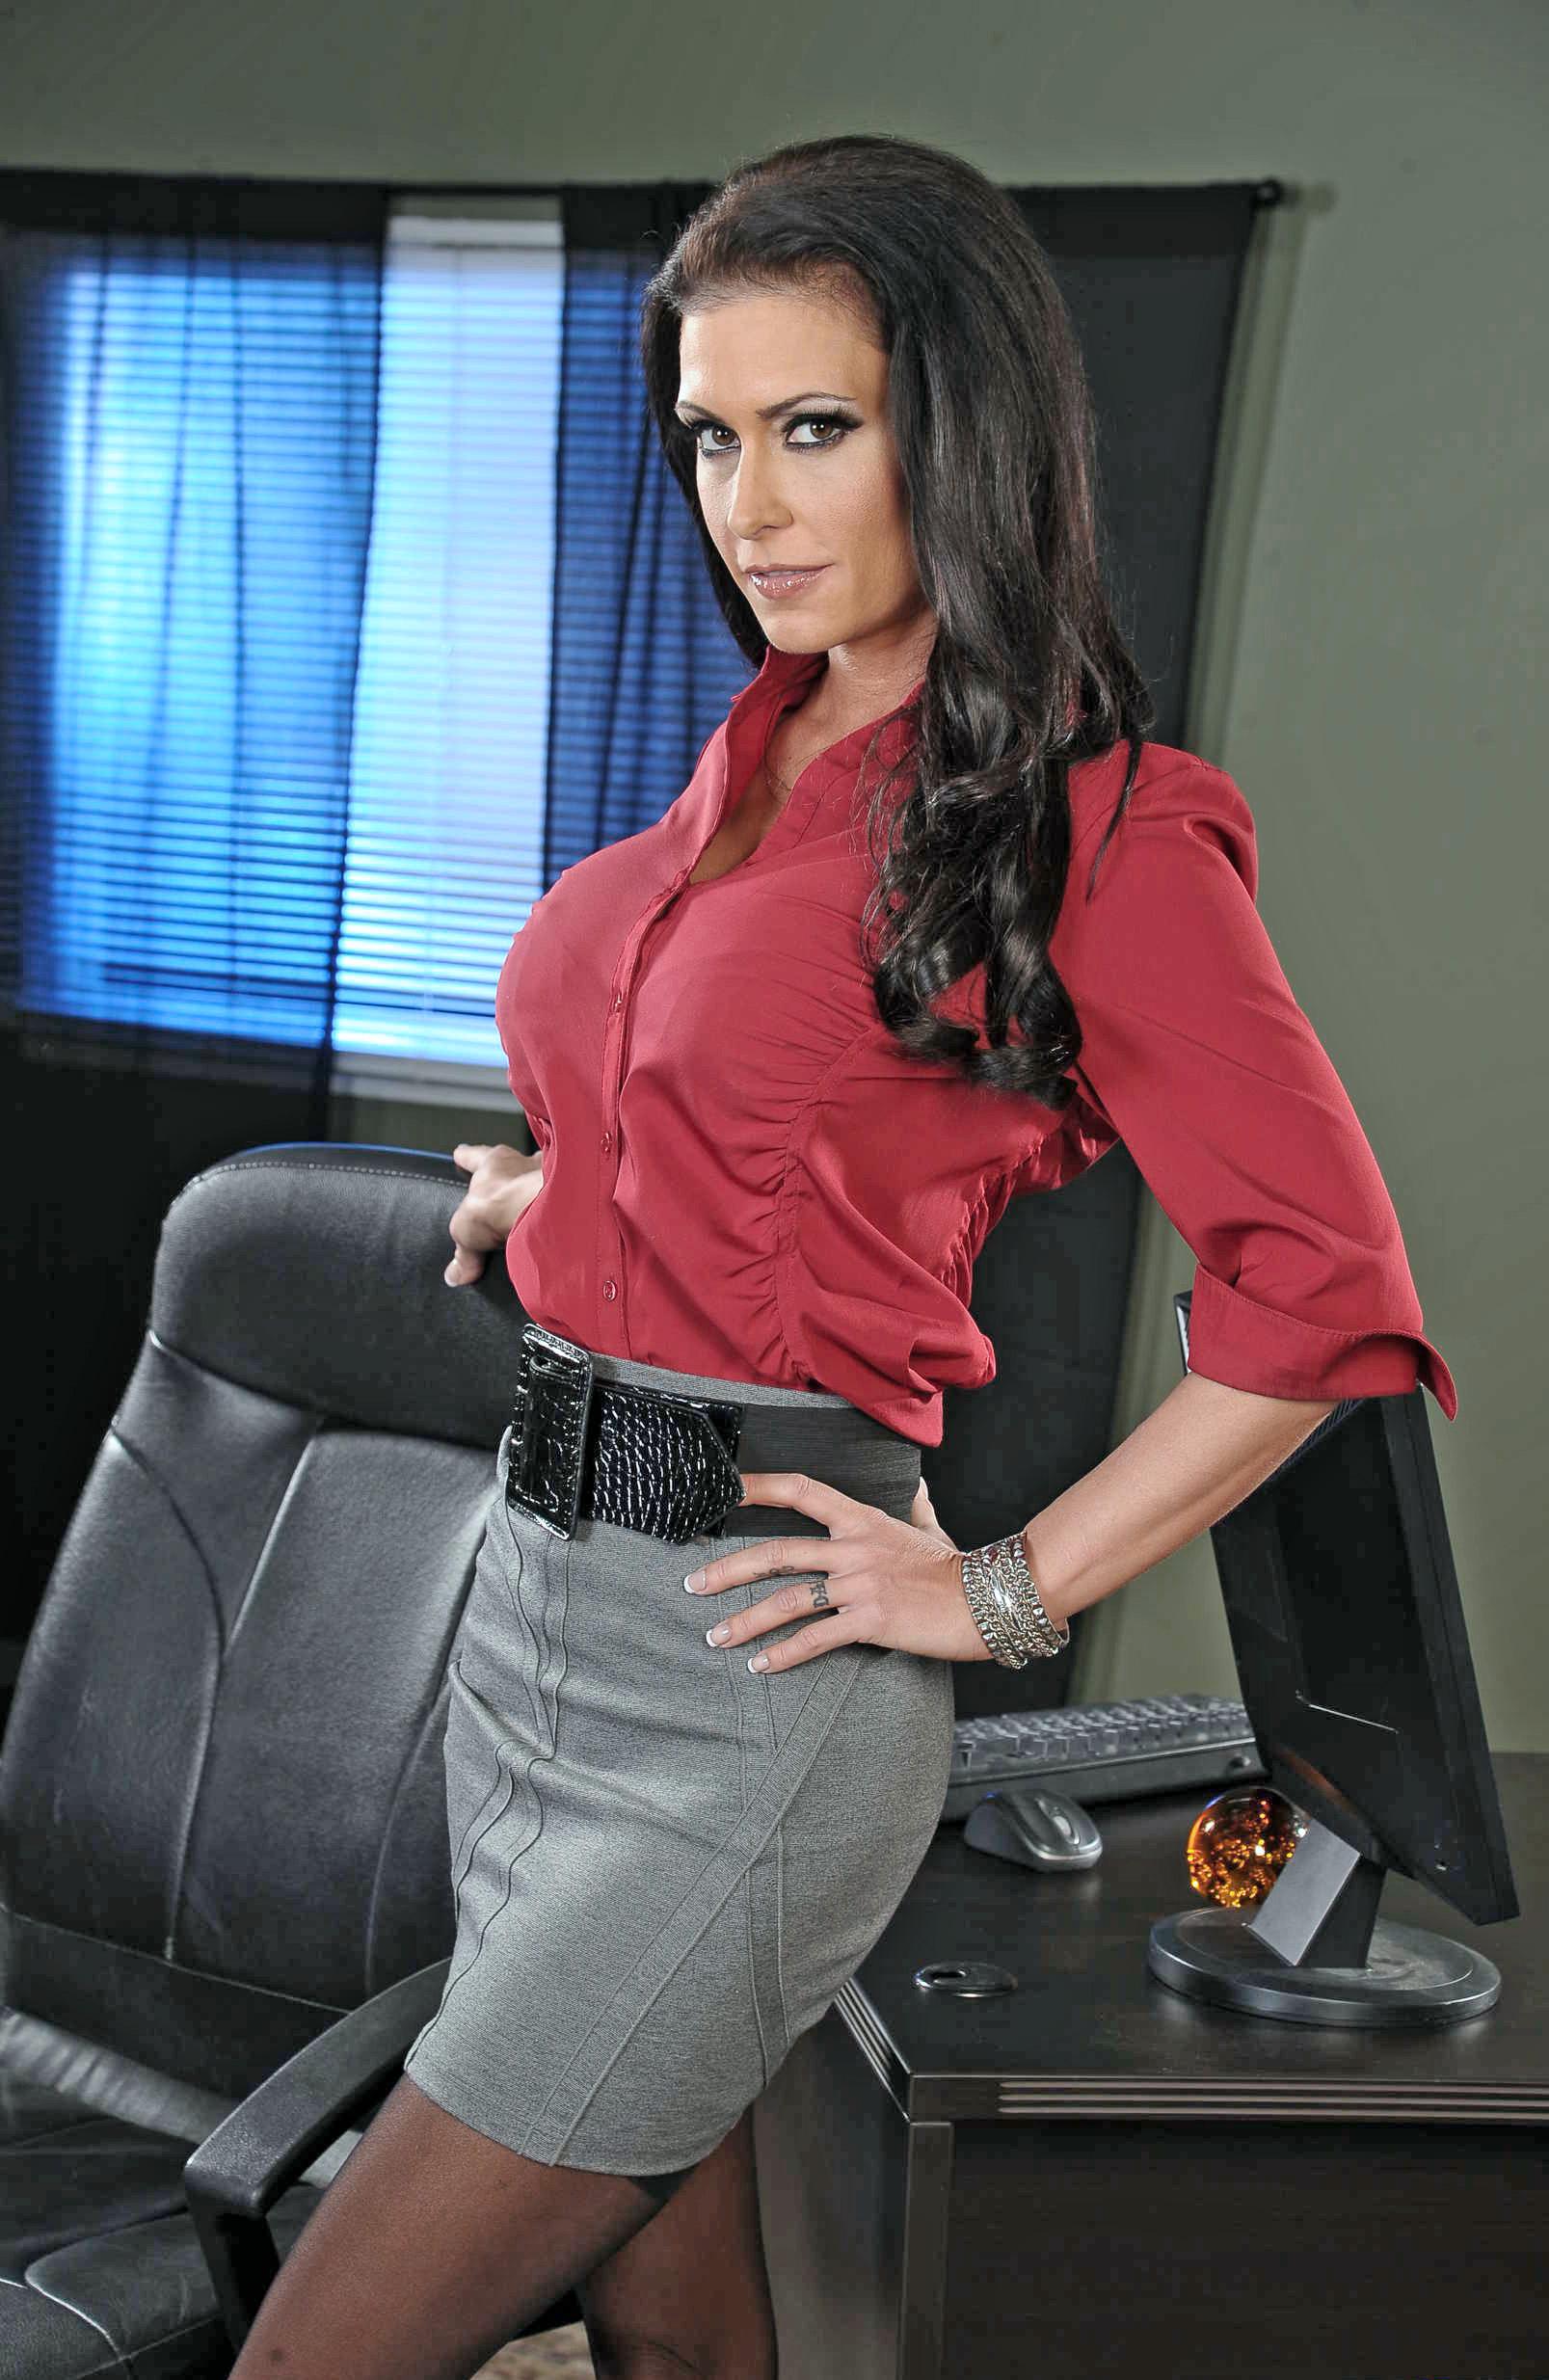 Boss amp a secretary mom 10